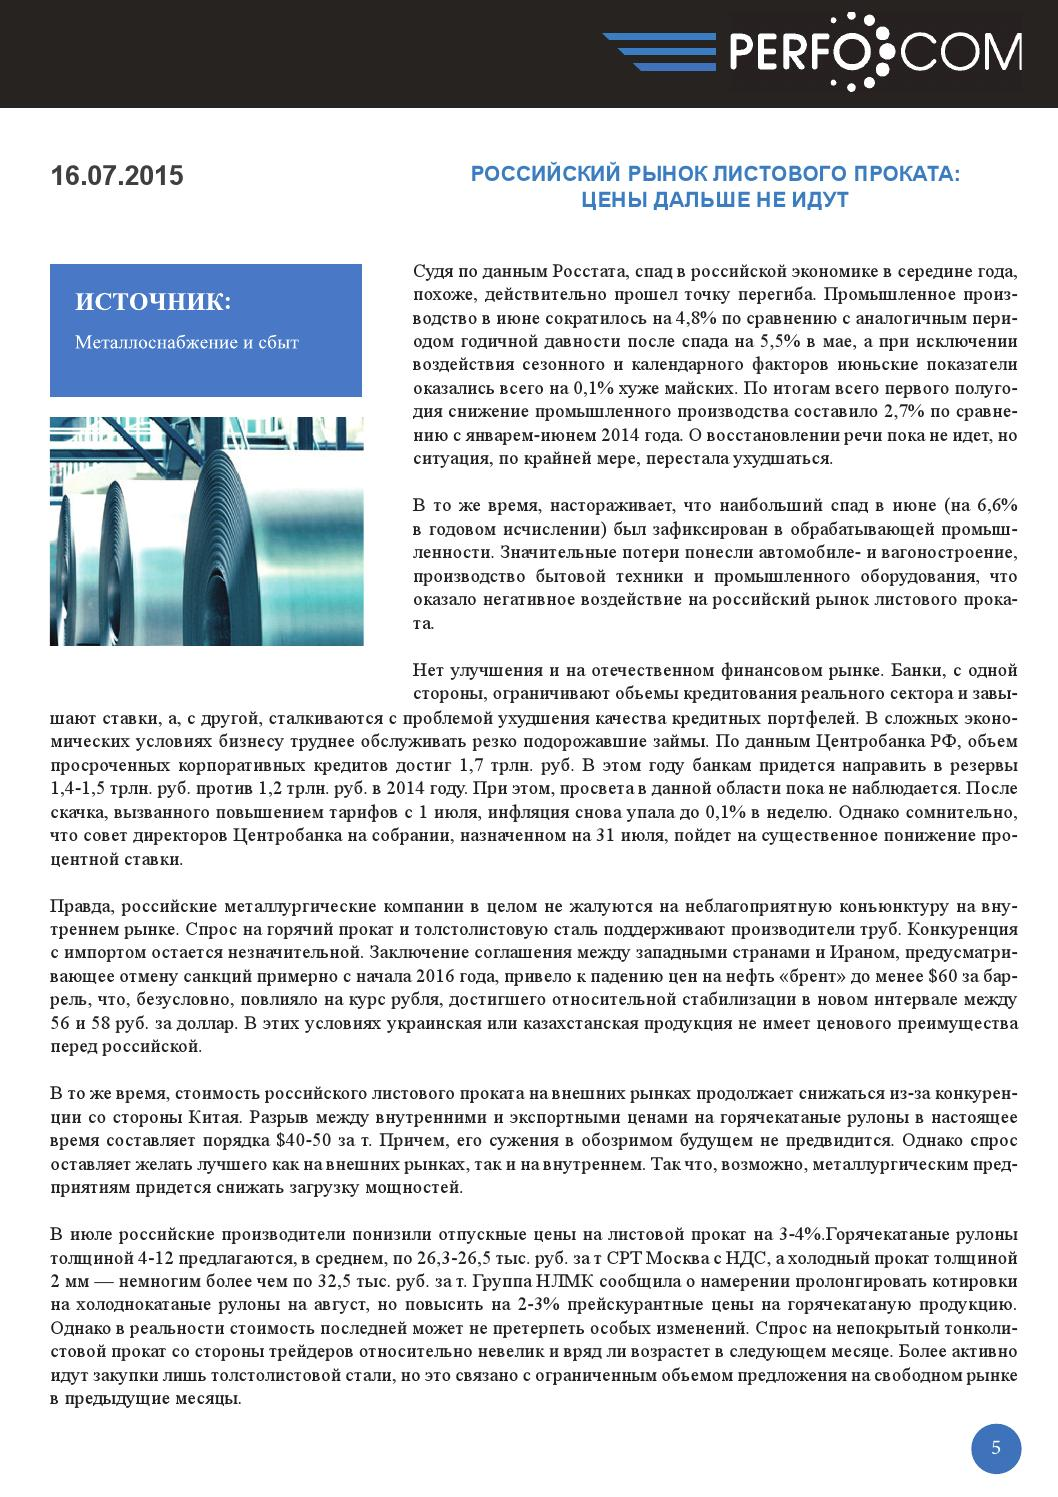 677e4e8fc Дайджест металлопроката №25 | 13 - 17 июля 2015 by Perfocomnn perfocom -  issuu